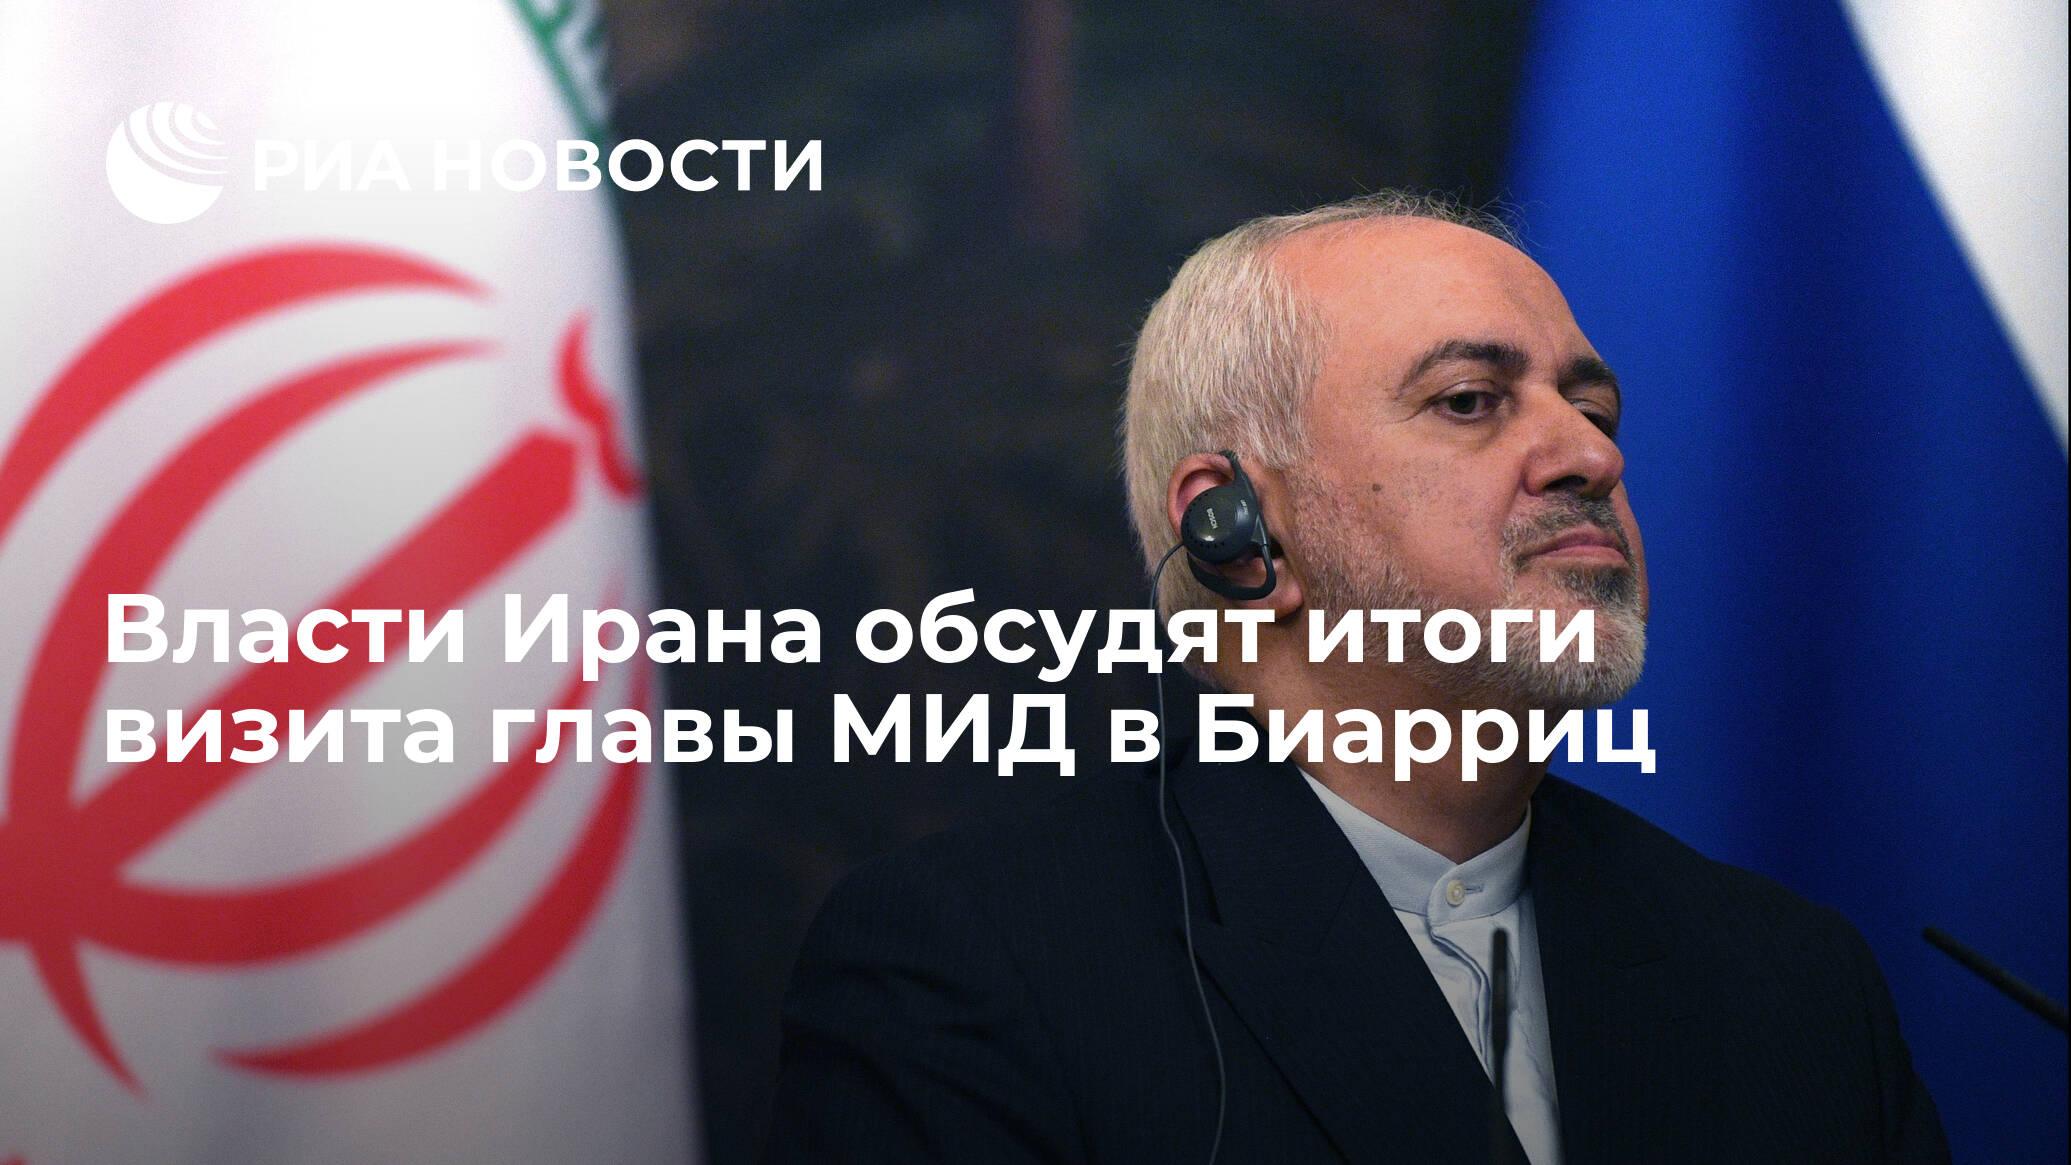 Власти Ирана обсудят итоги визита главы МИД в Биарриц - РИА ...